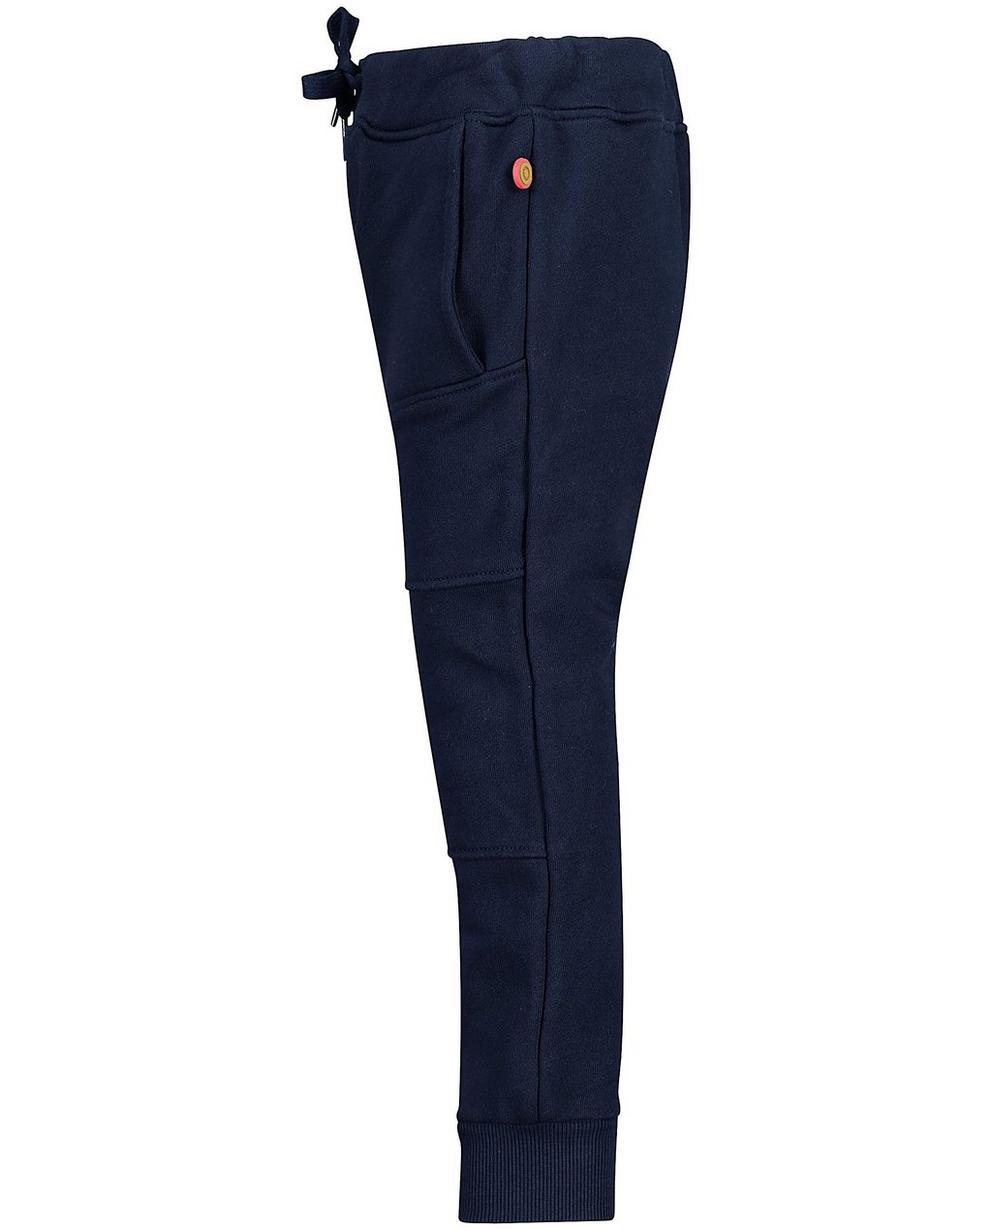 Pantalons - navy - Nachtblauwe sweatbroek